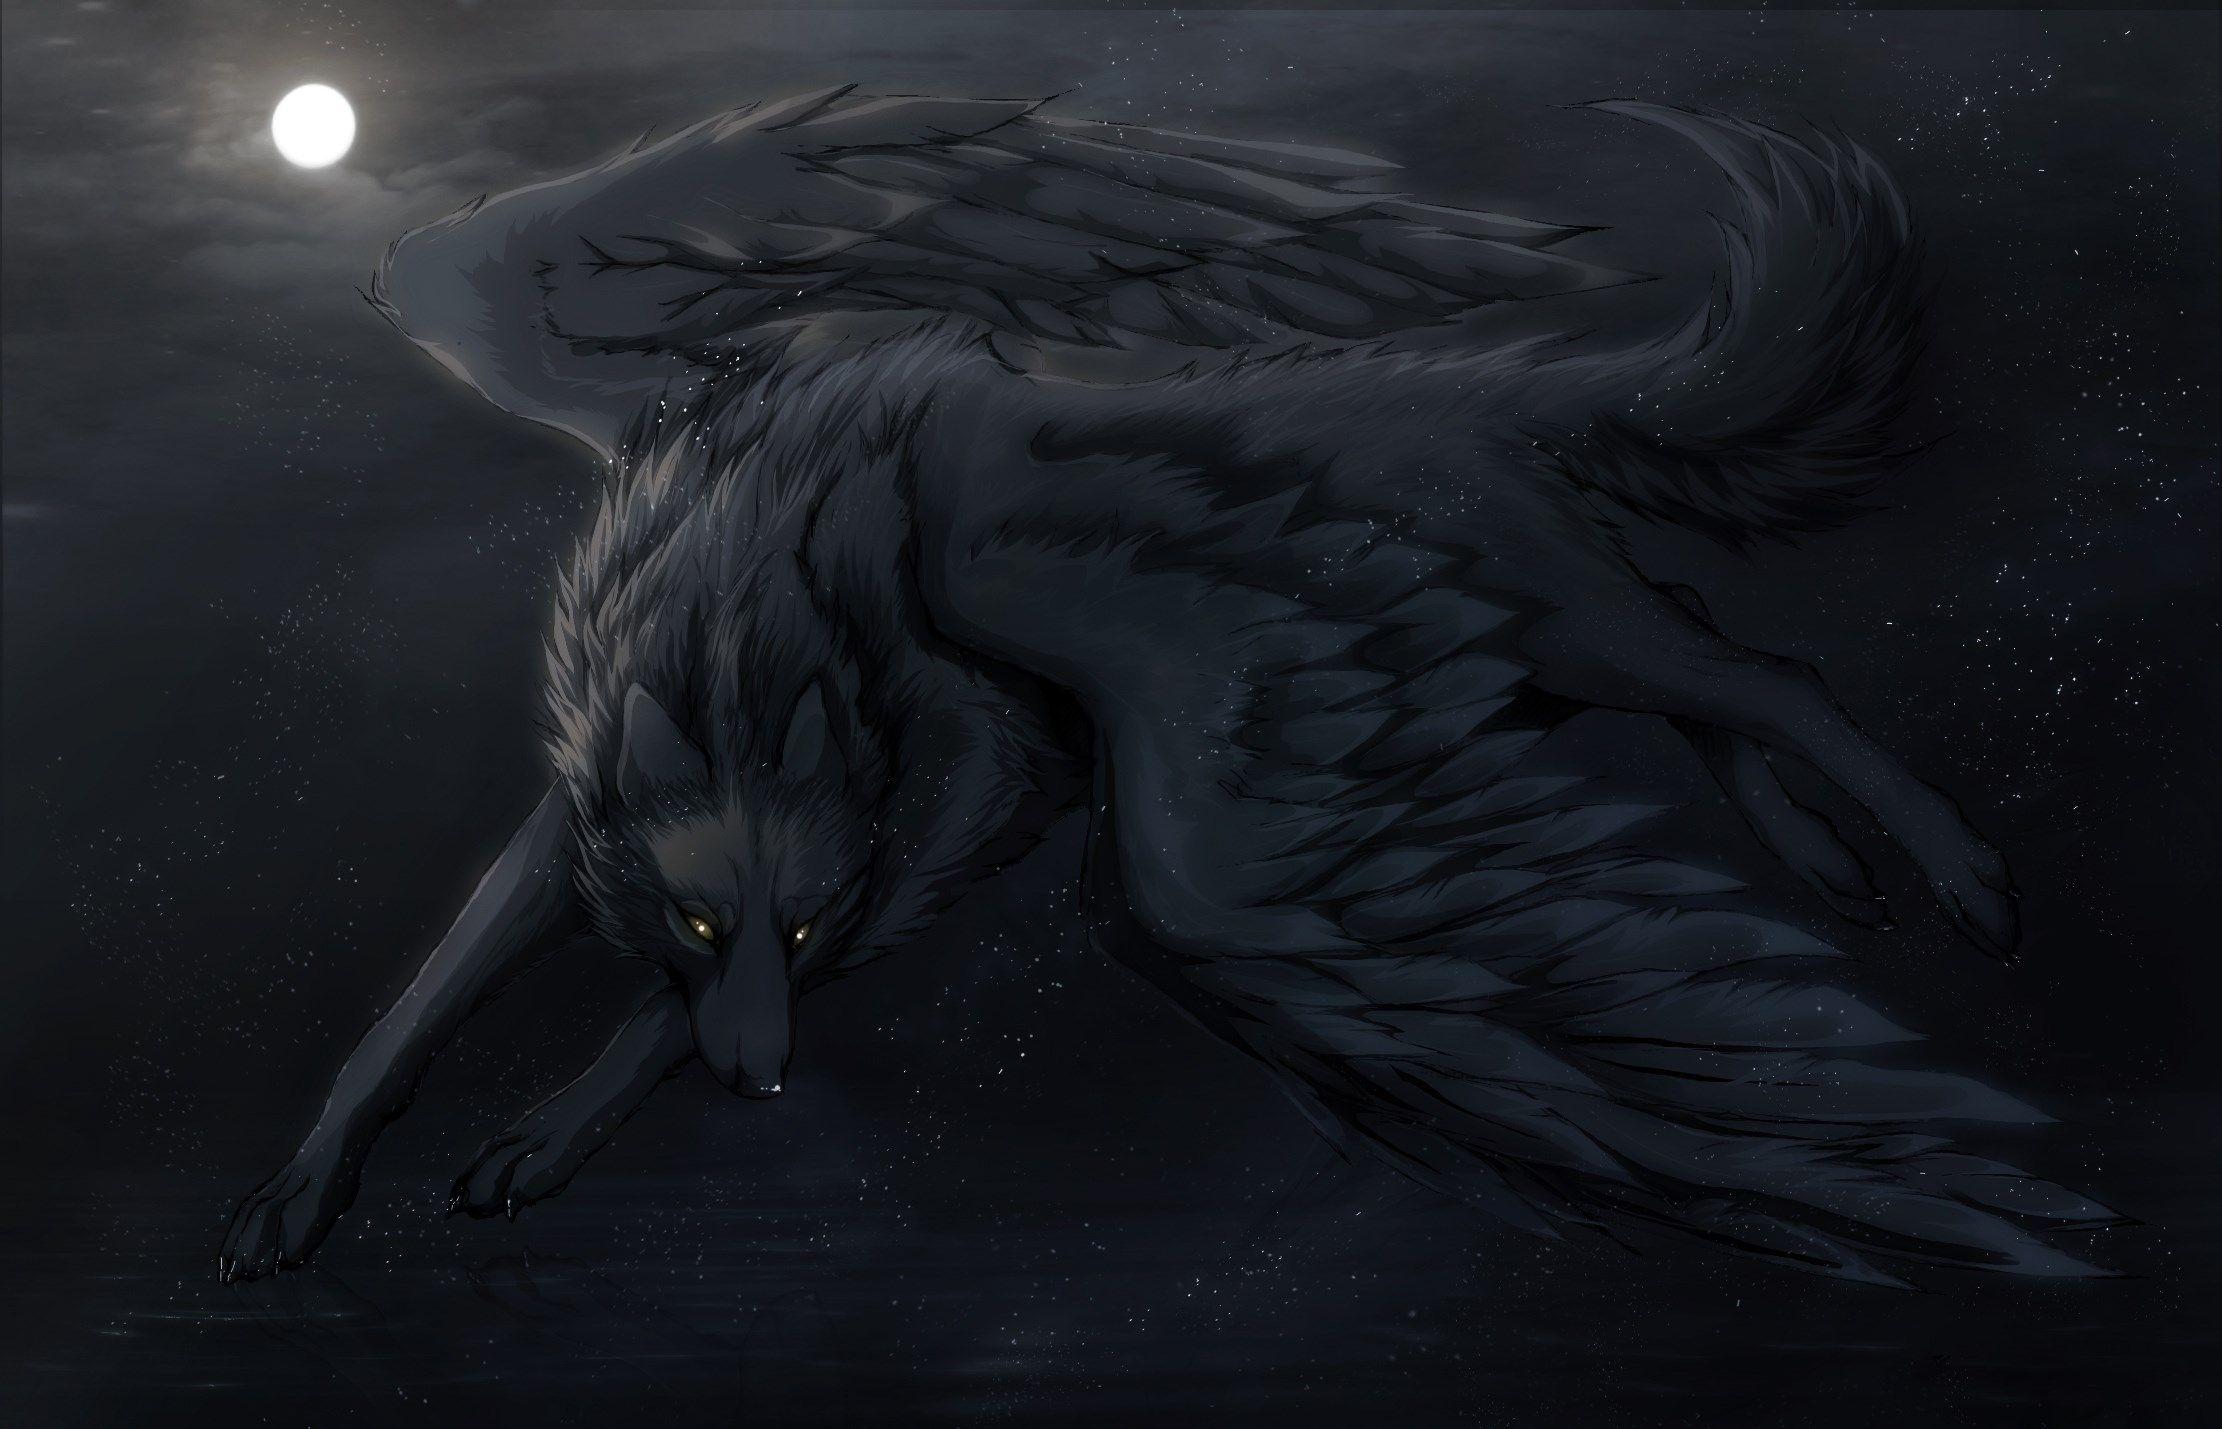 Tattoo background shading ideas color x full size wolf  likeagod  pinterest  wolf